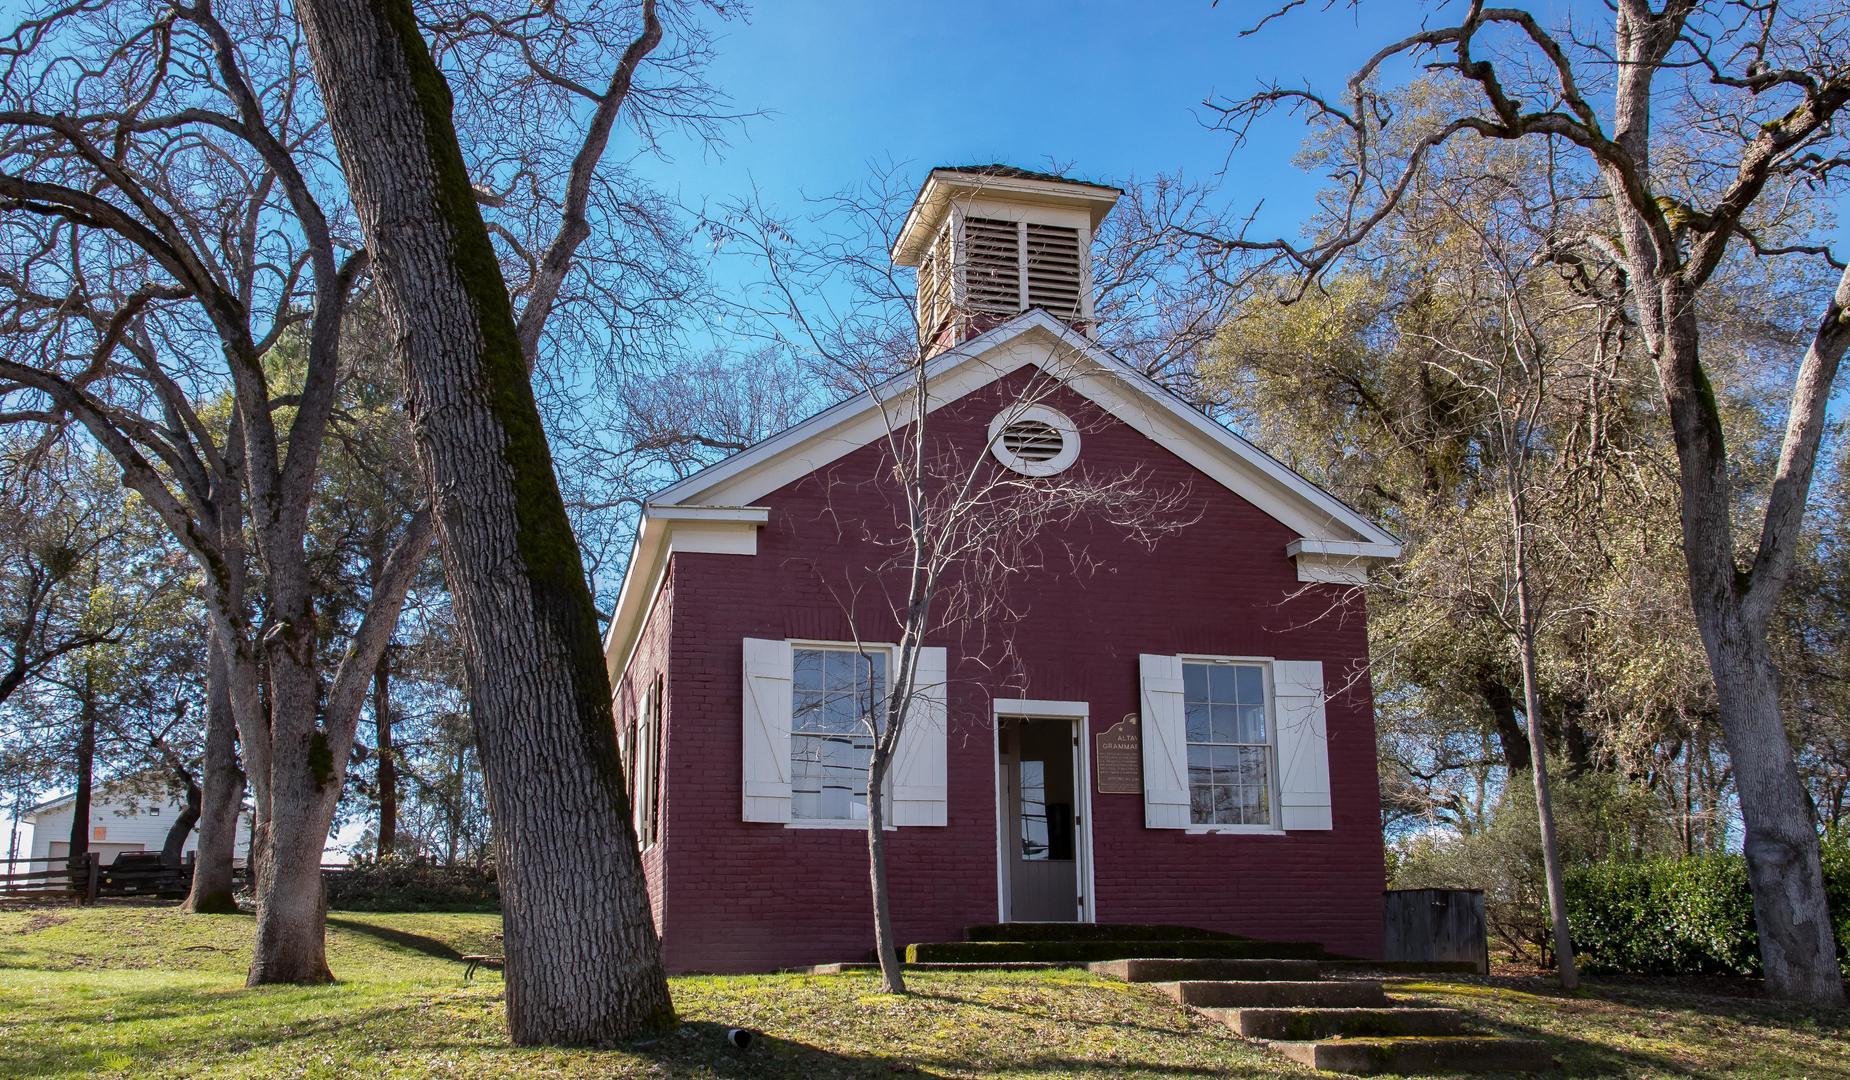 Altaville Schoolhouse